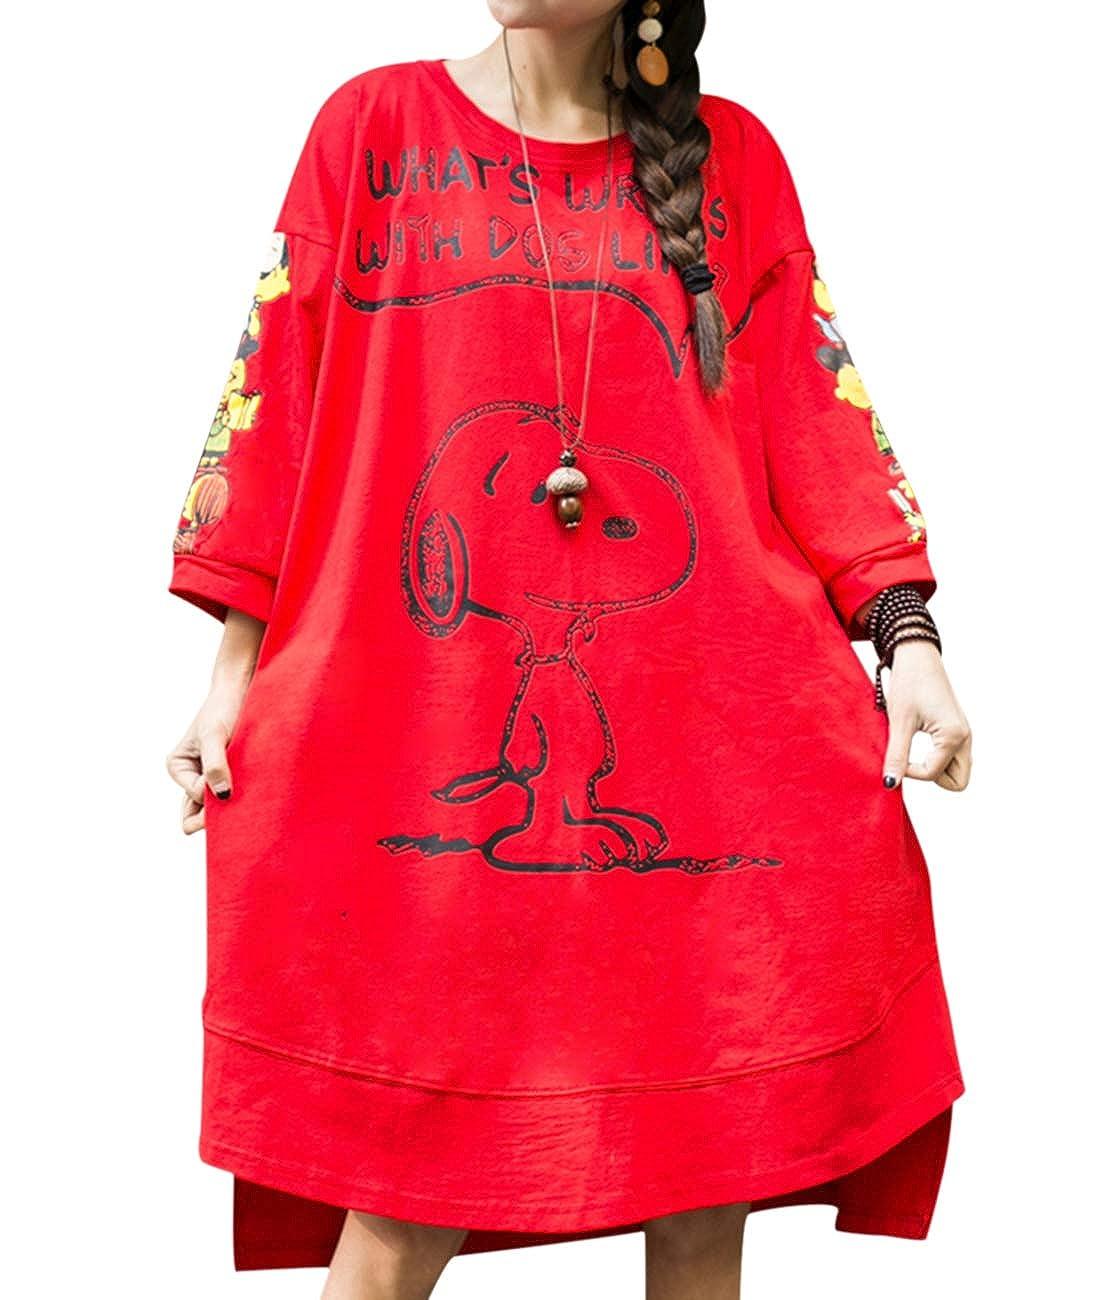 5e4e624e3749 YESNO Women Casual Loose Tunic Dress Cute Snoopy Print 3/4 Sleeve T-Shirts  w/Pockets F26 (M, Red) at Amazon Women's Clothing store: